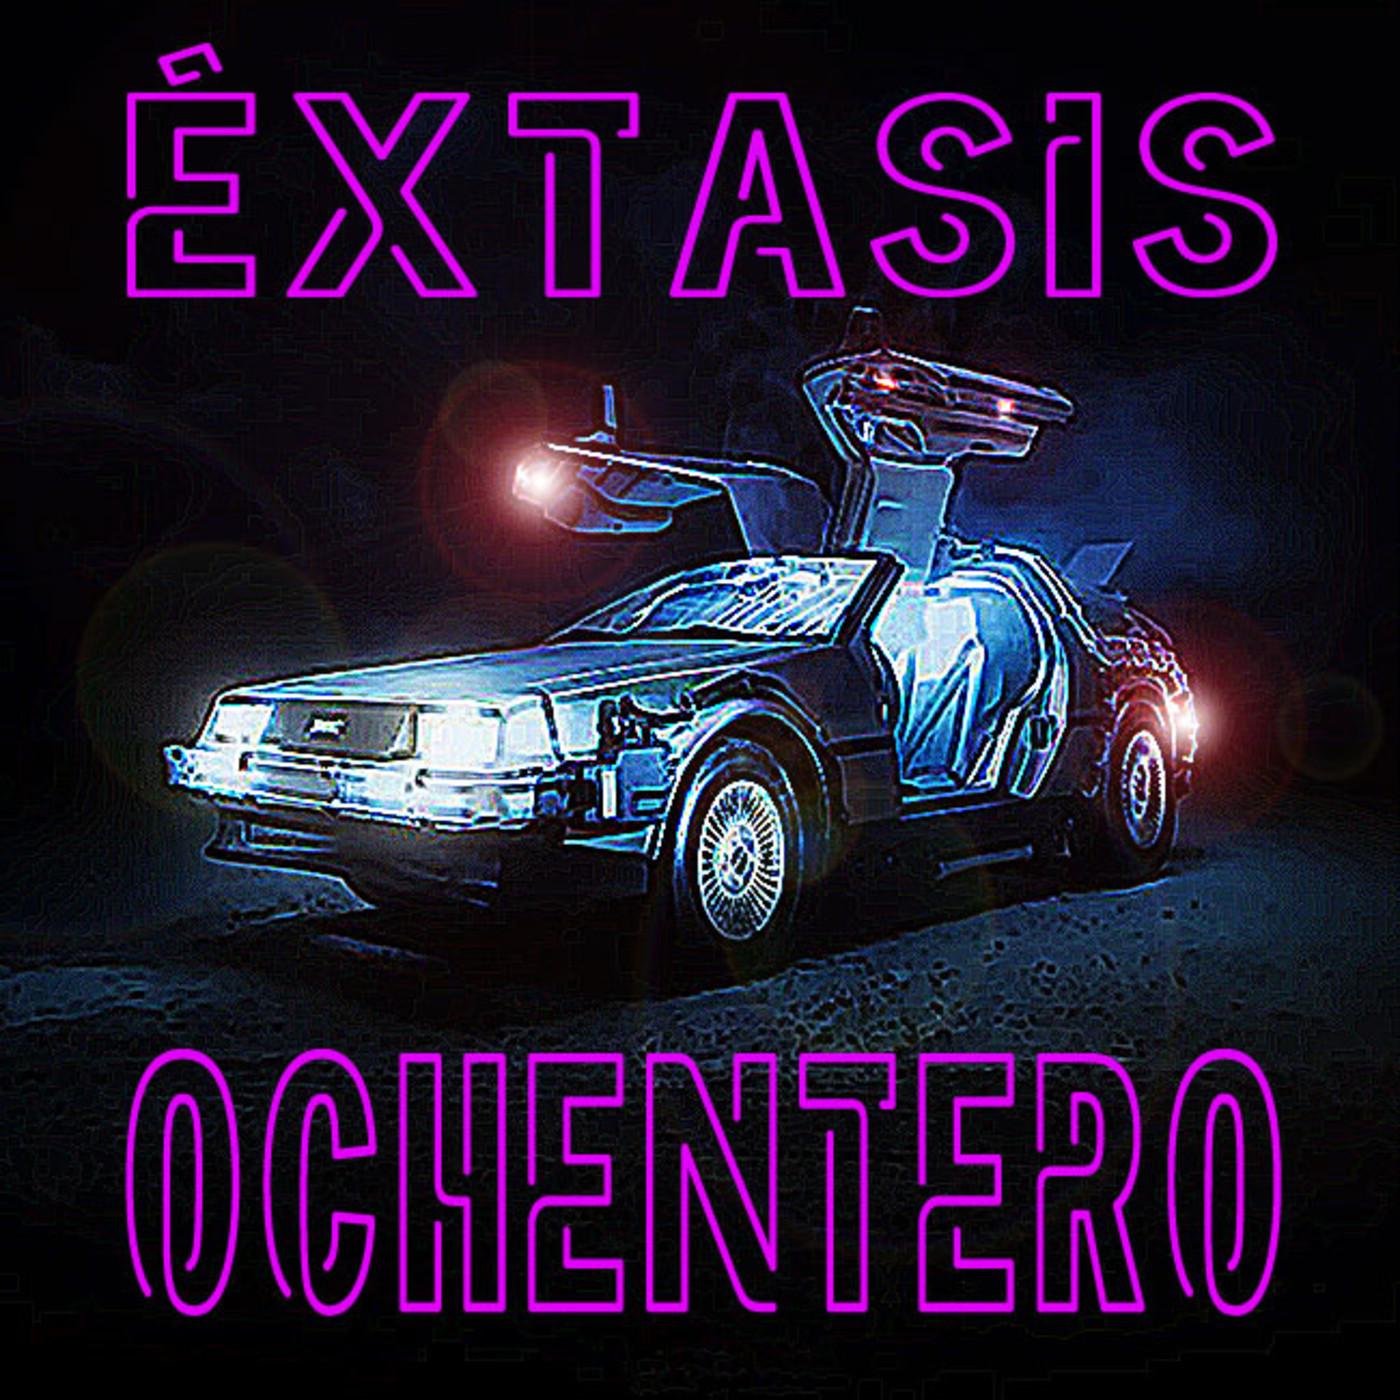 Fila9 1x04 - Ready Player One y el extasis ochentero